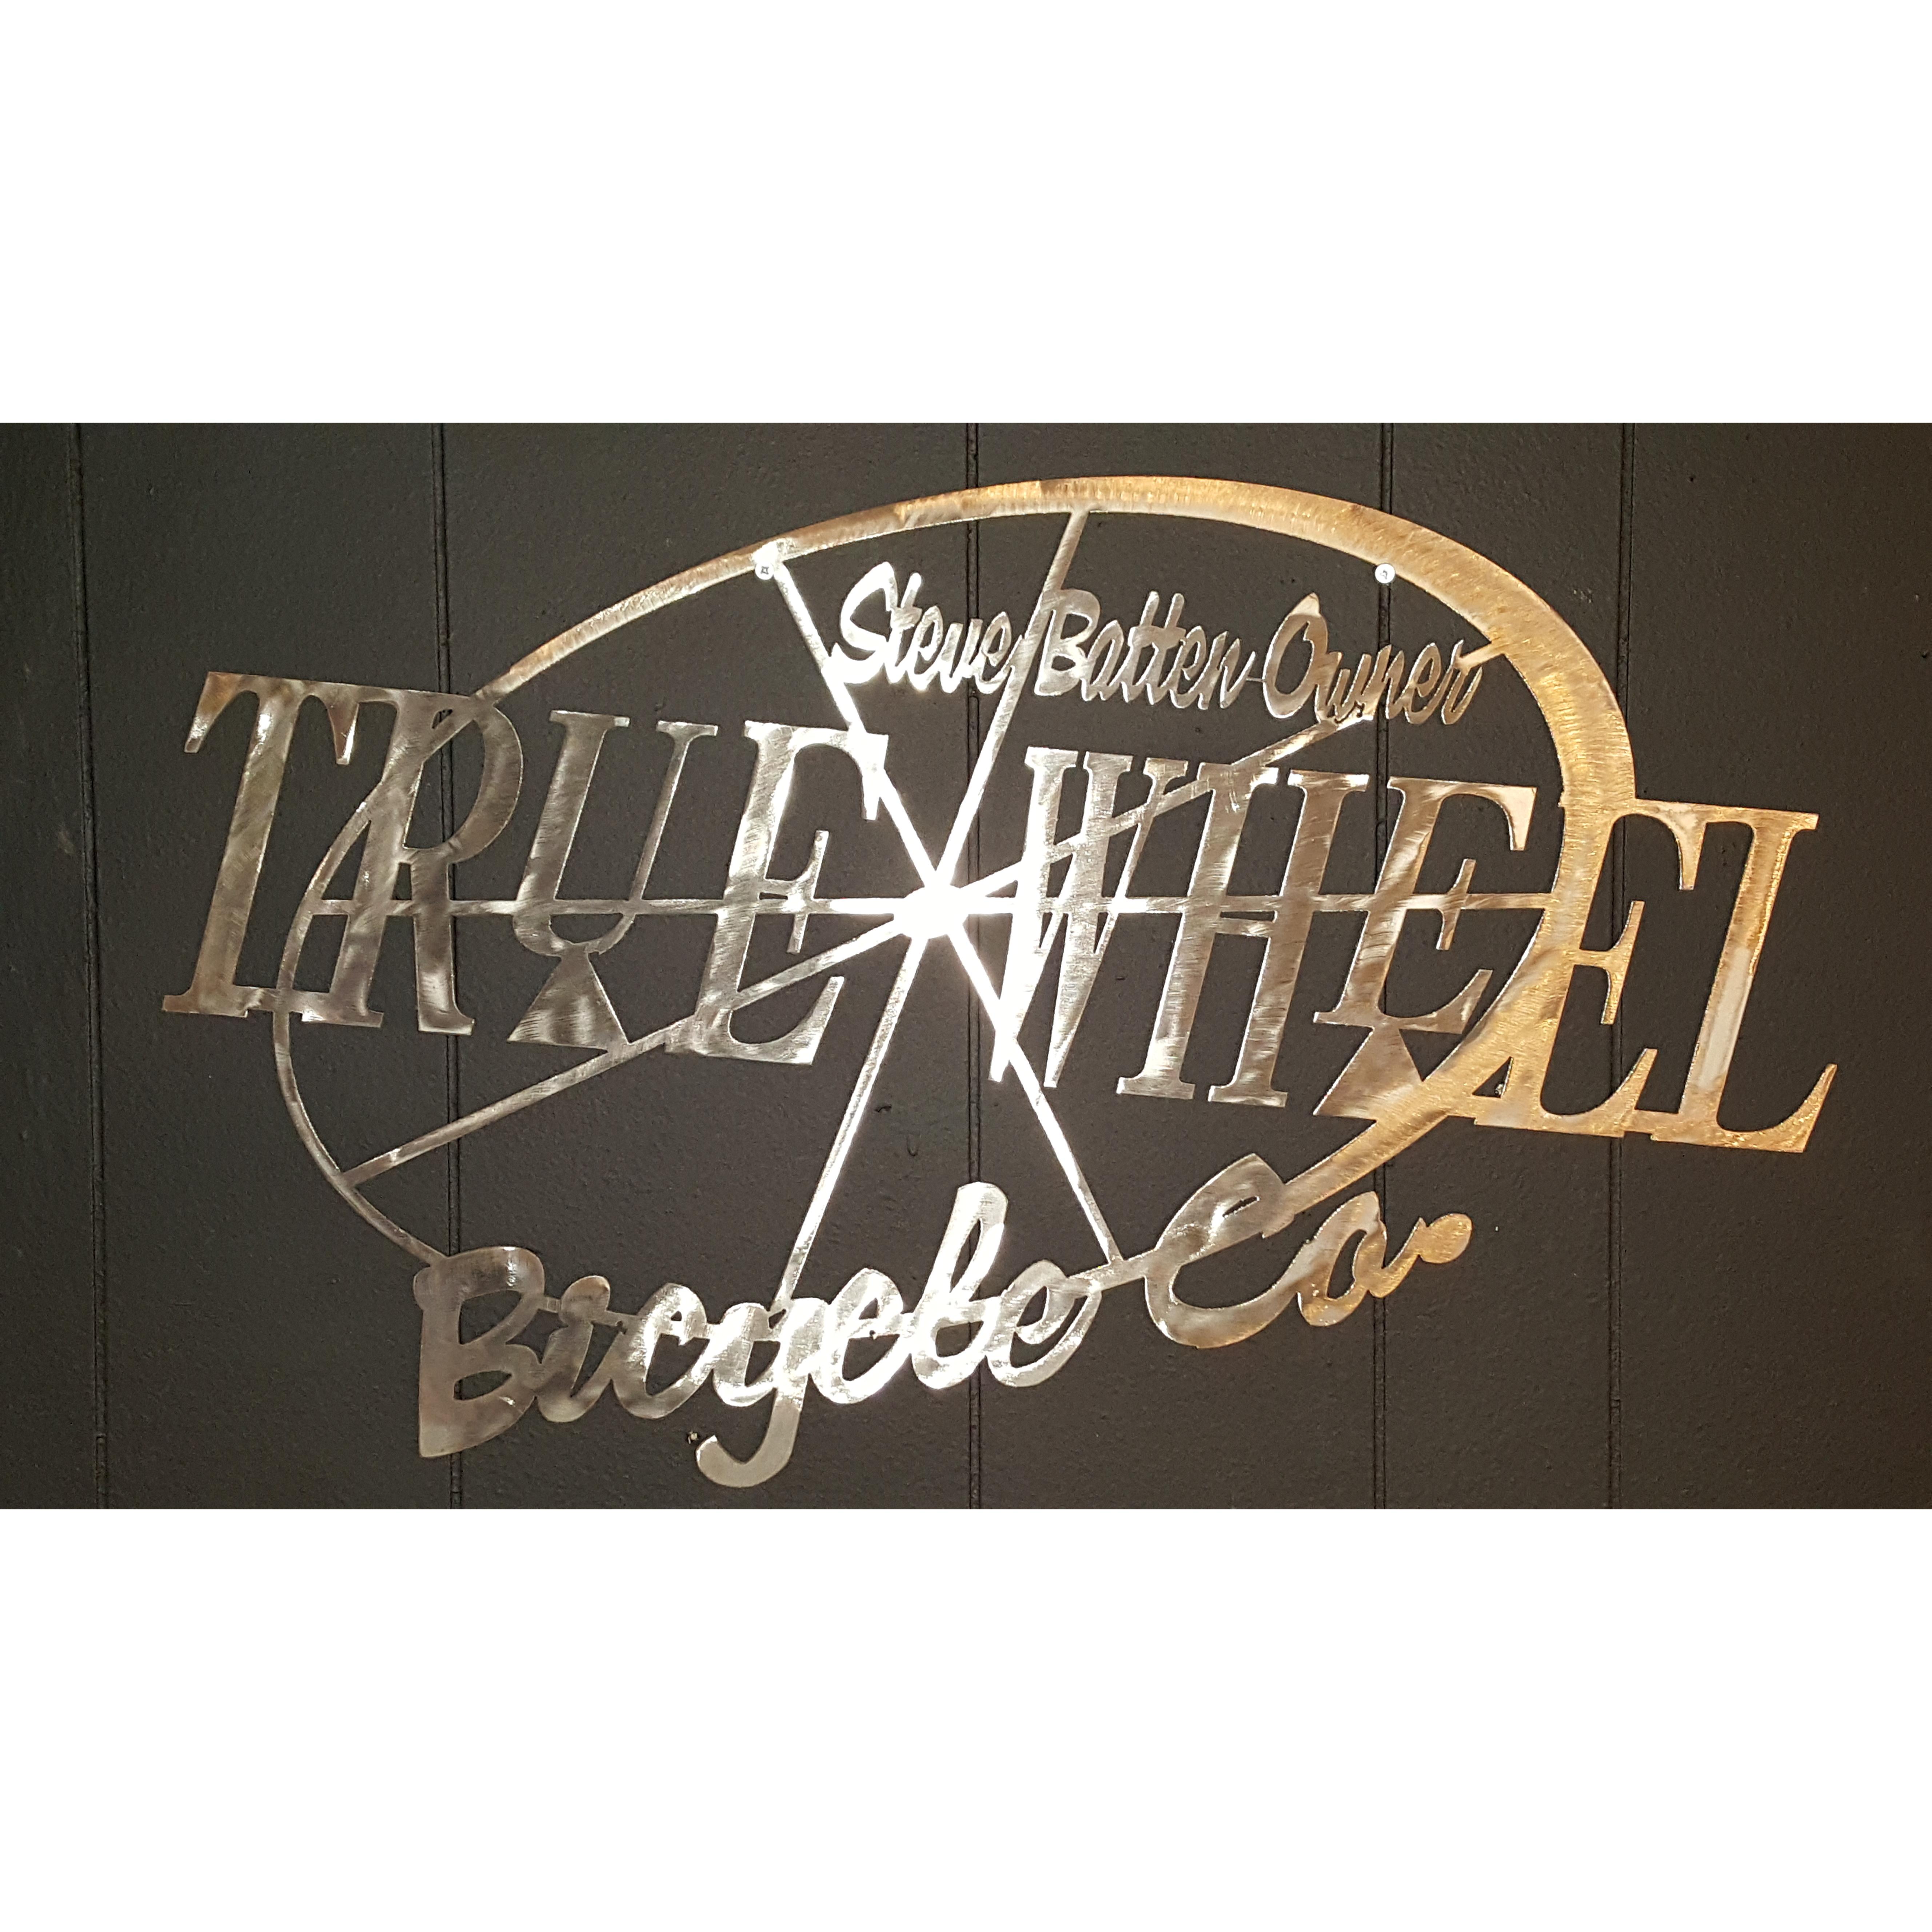 True Wheel Bicycle Co.